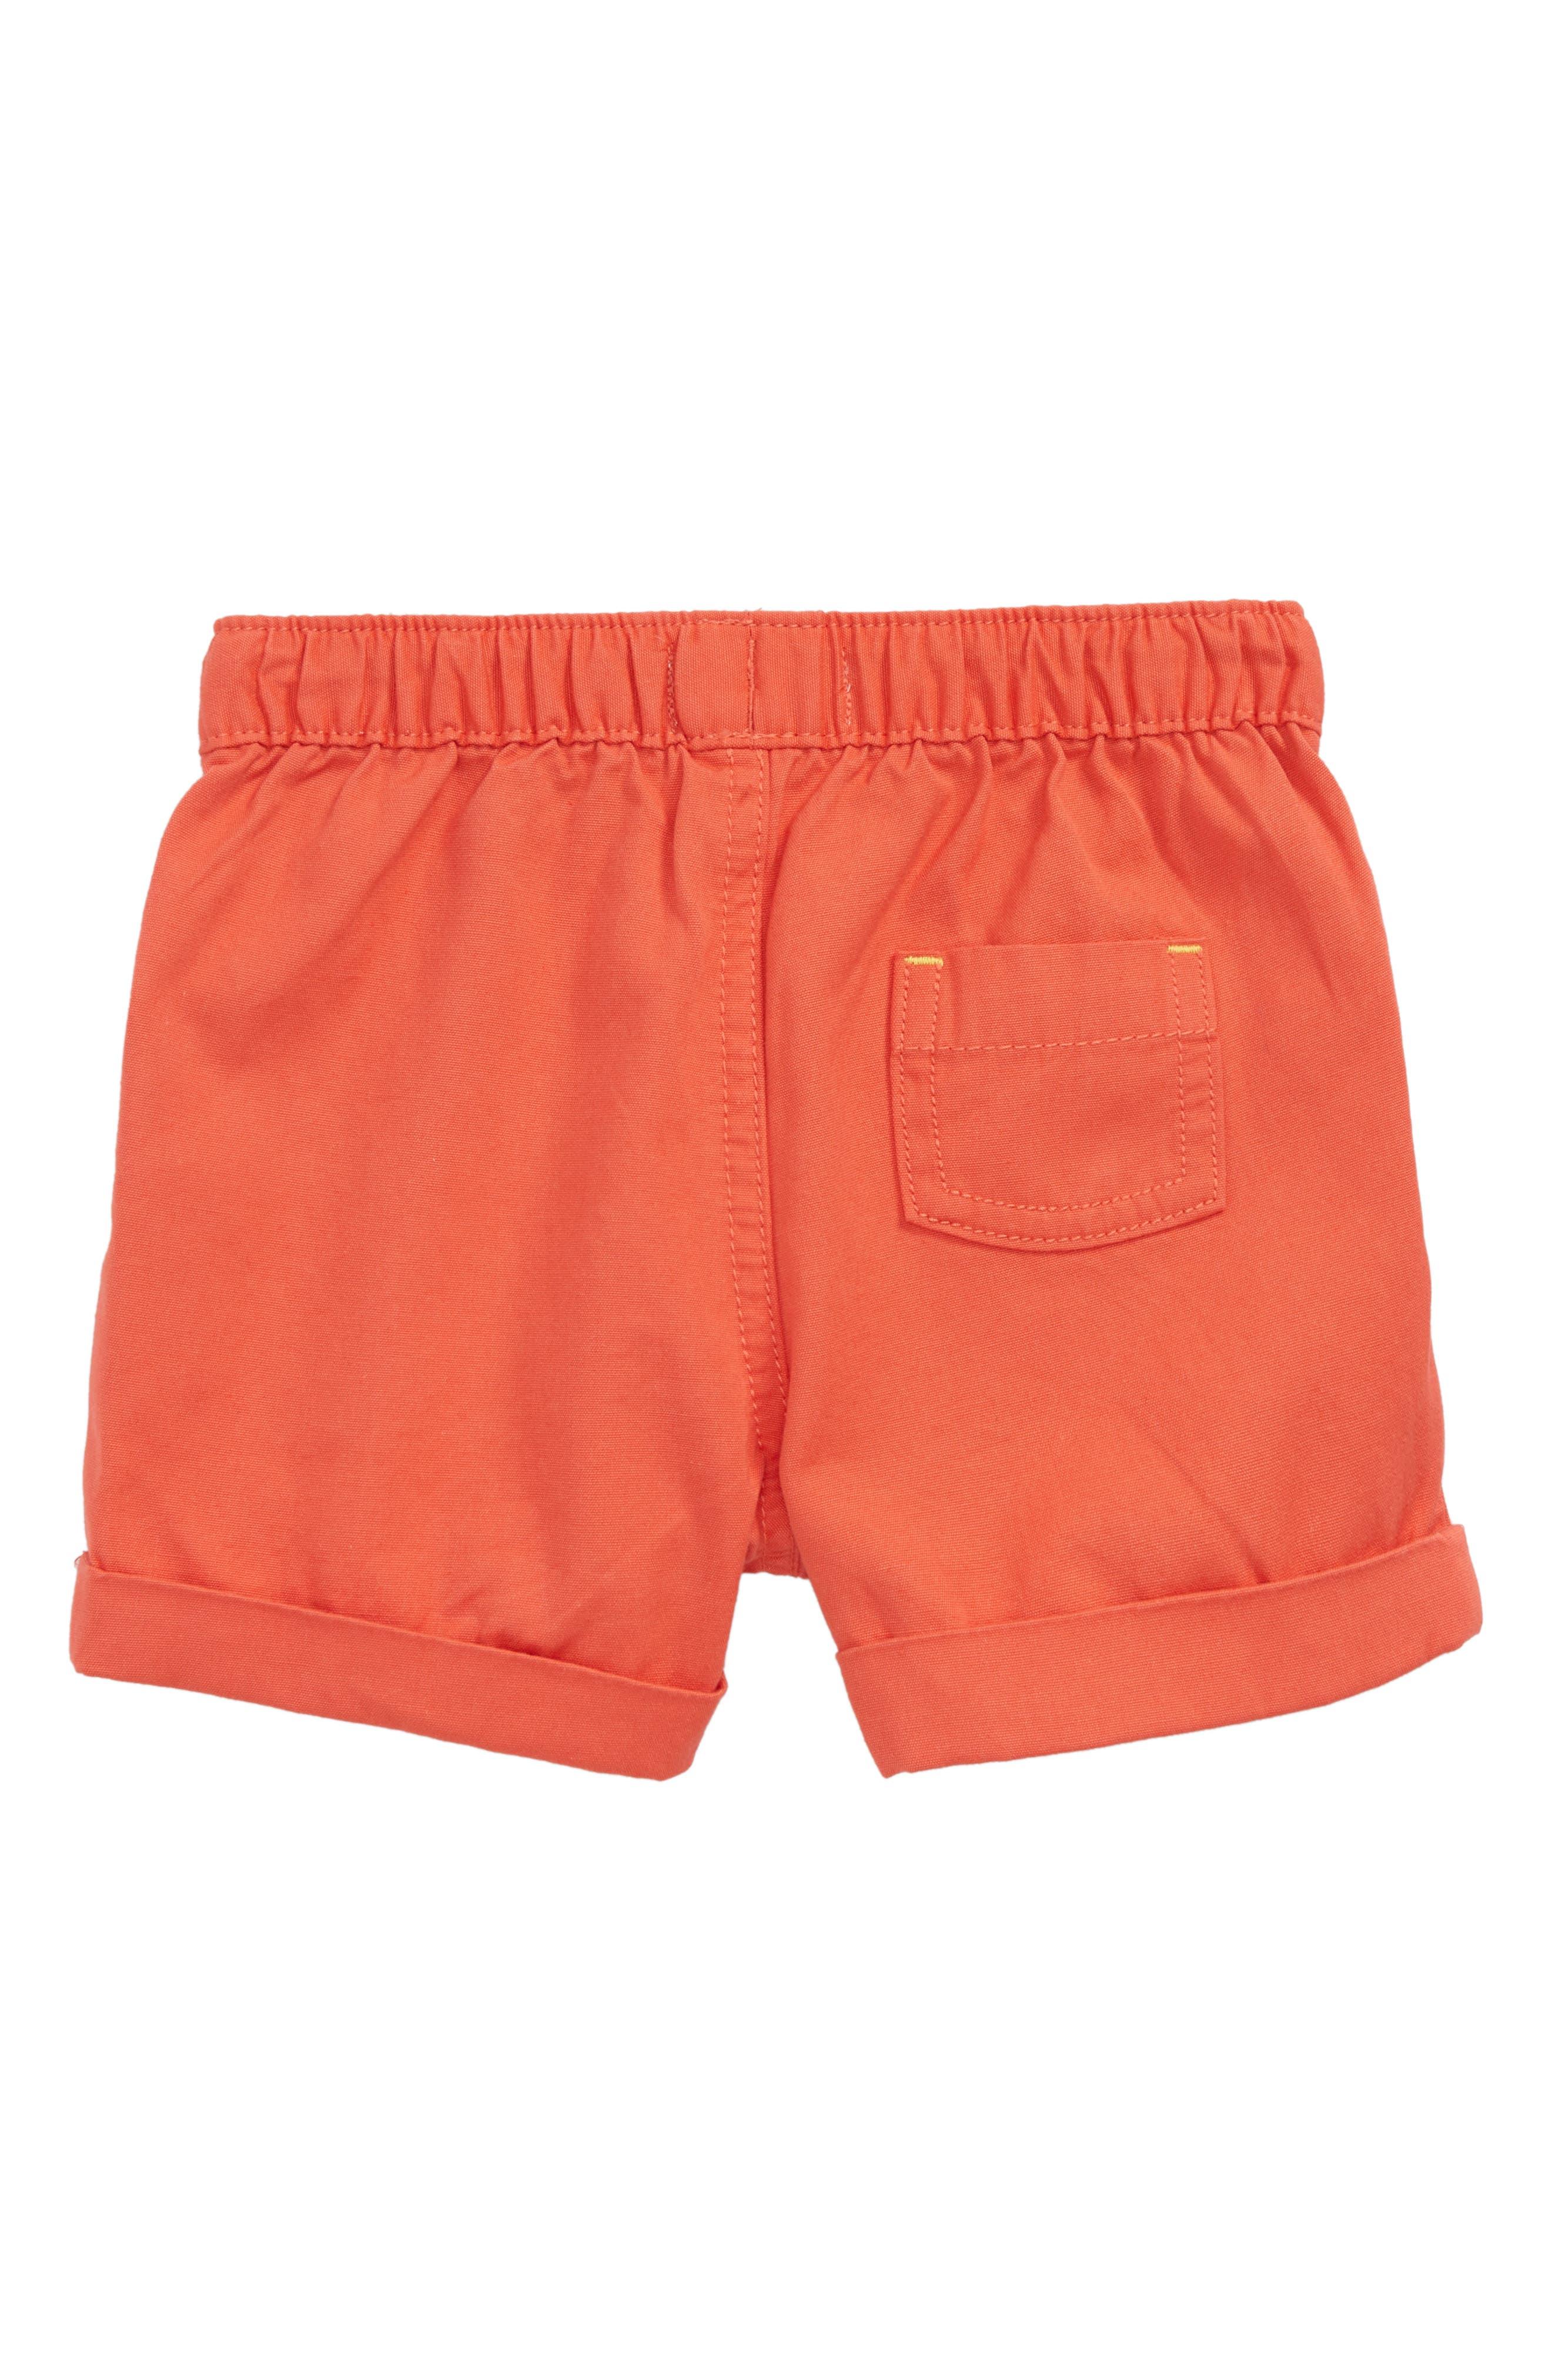 Explorer Shorts,                             Alternate thumbnail 2, color,                             Red Crayon